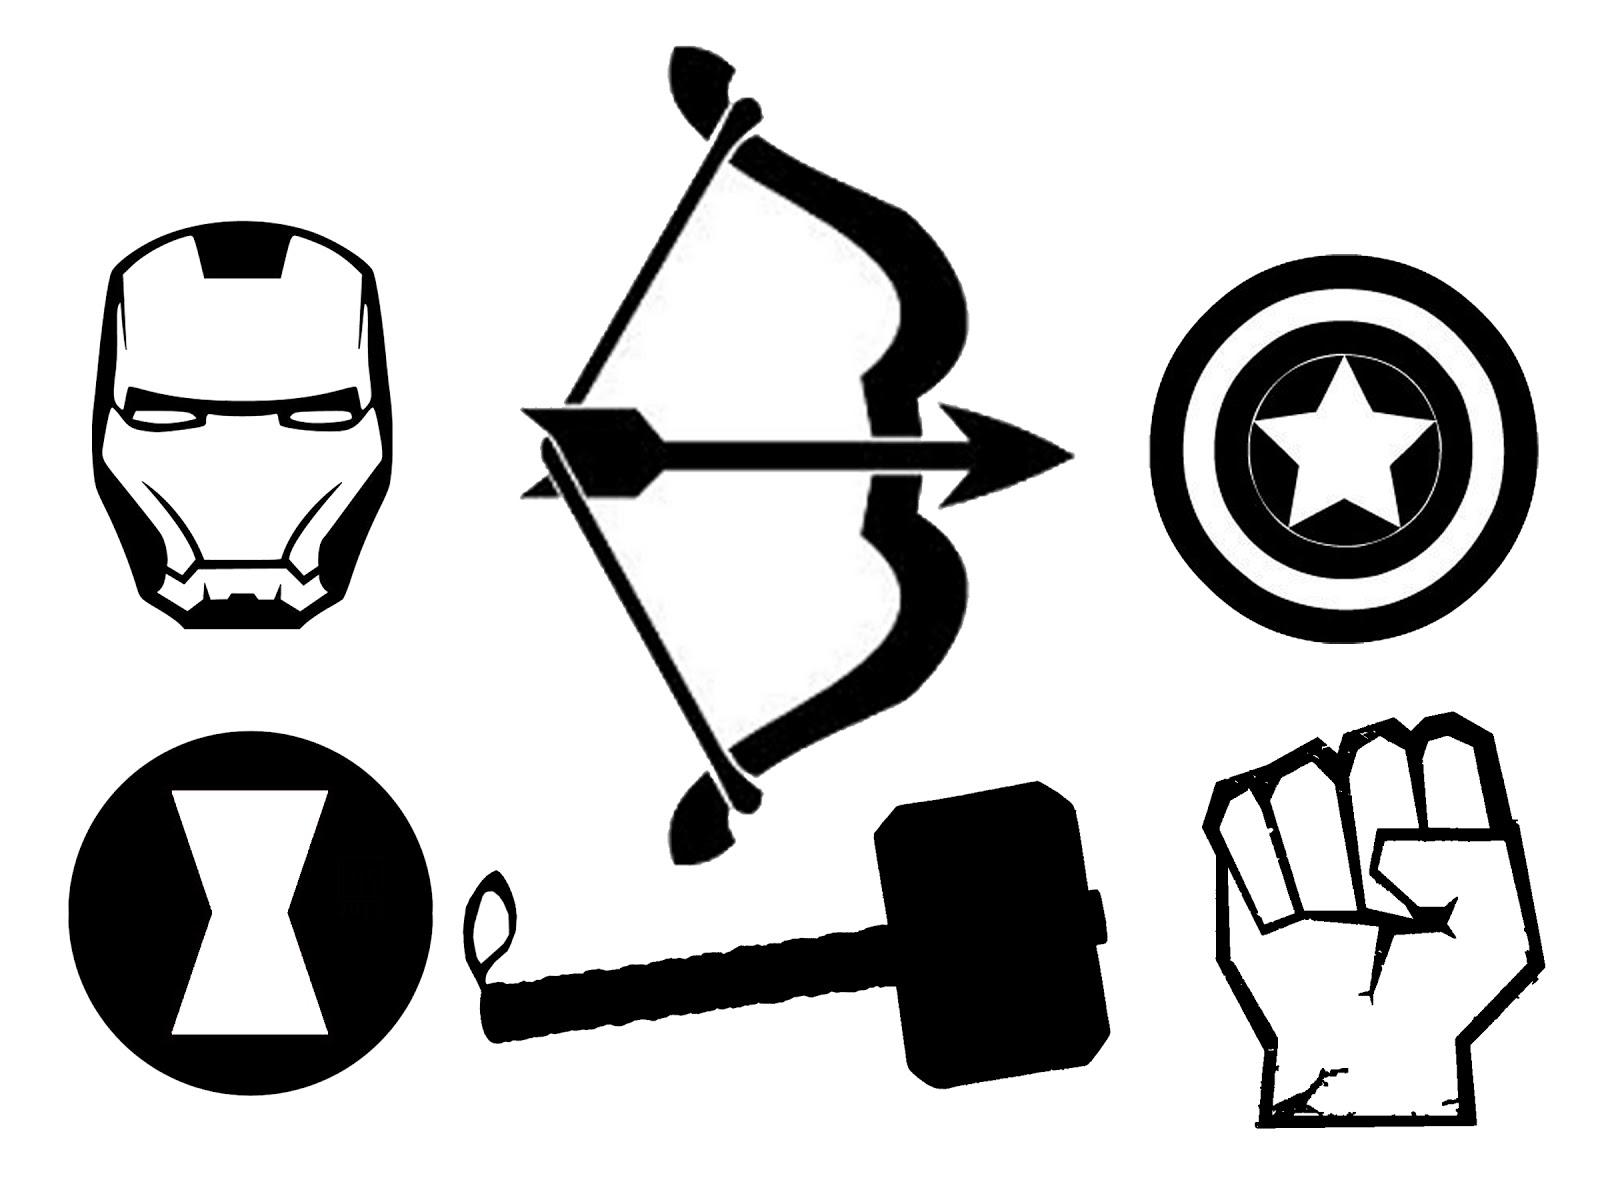 Hawkeye logo marvel clipart clip black and white stock Hawkeye logo marvel clipart - ClipartFest clip black and white stock